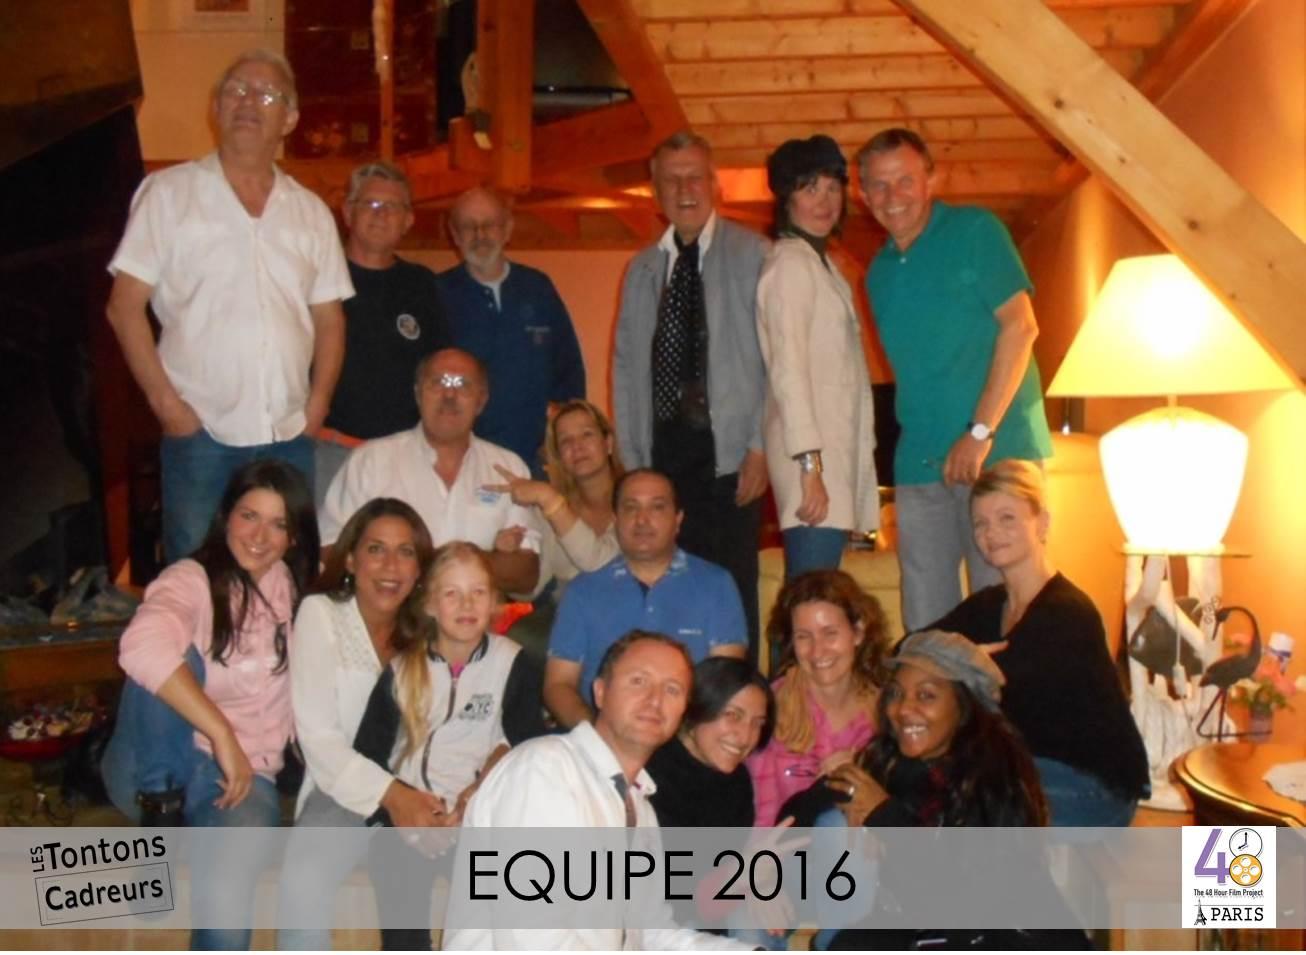 Equipe 2016 48hfp